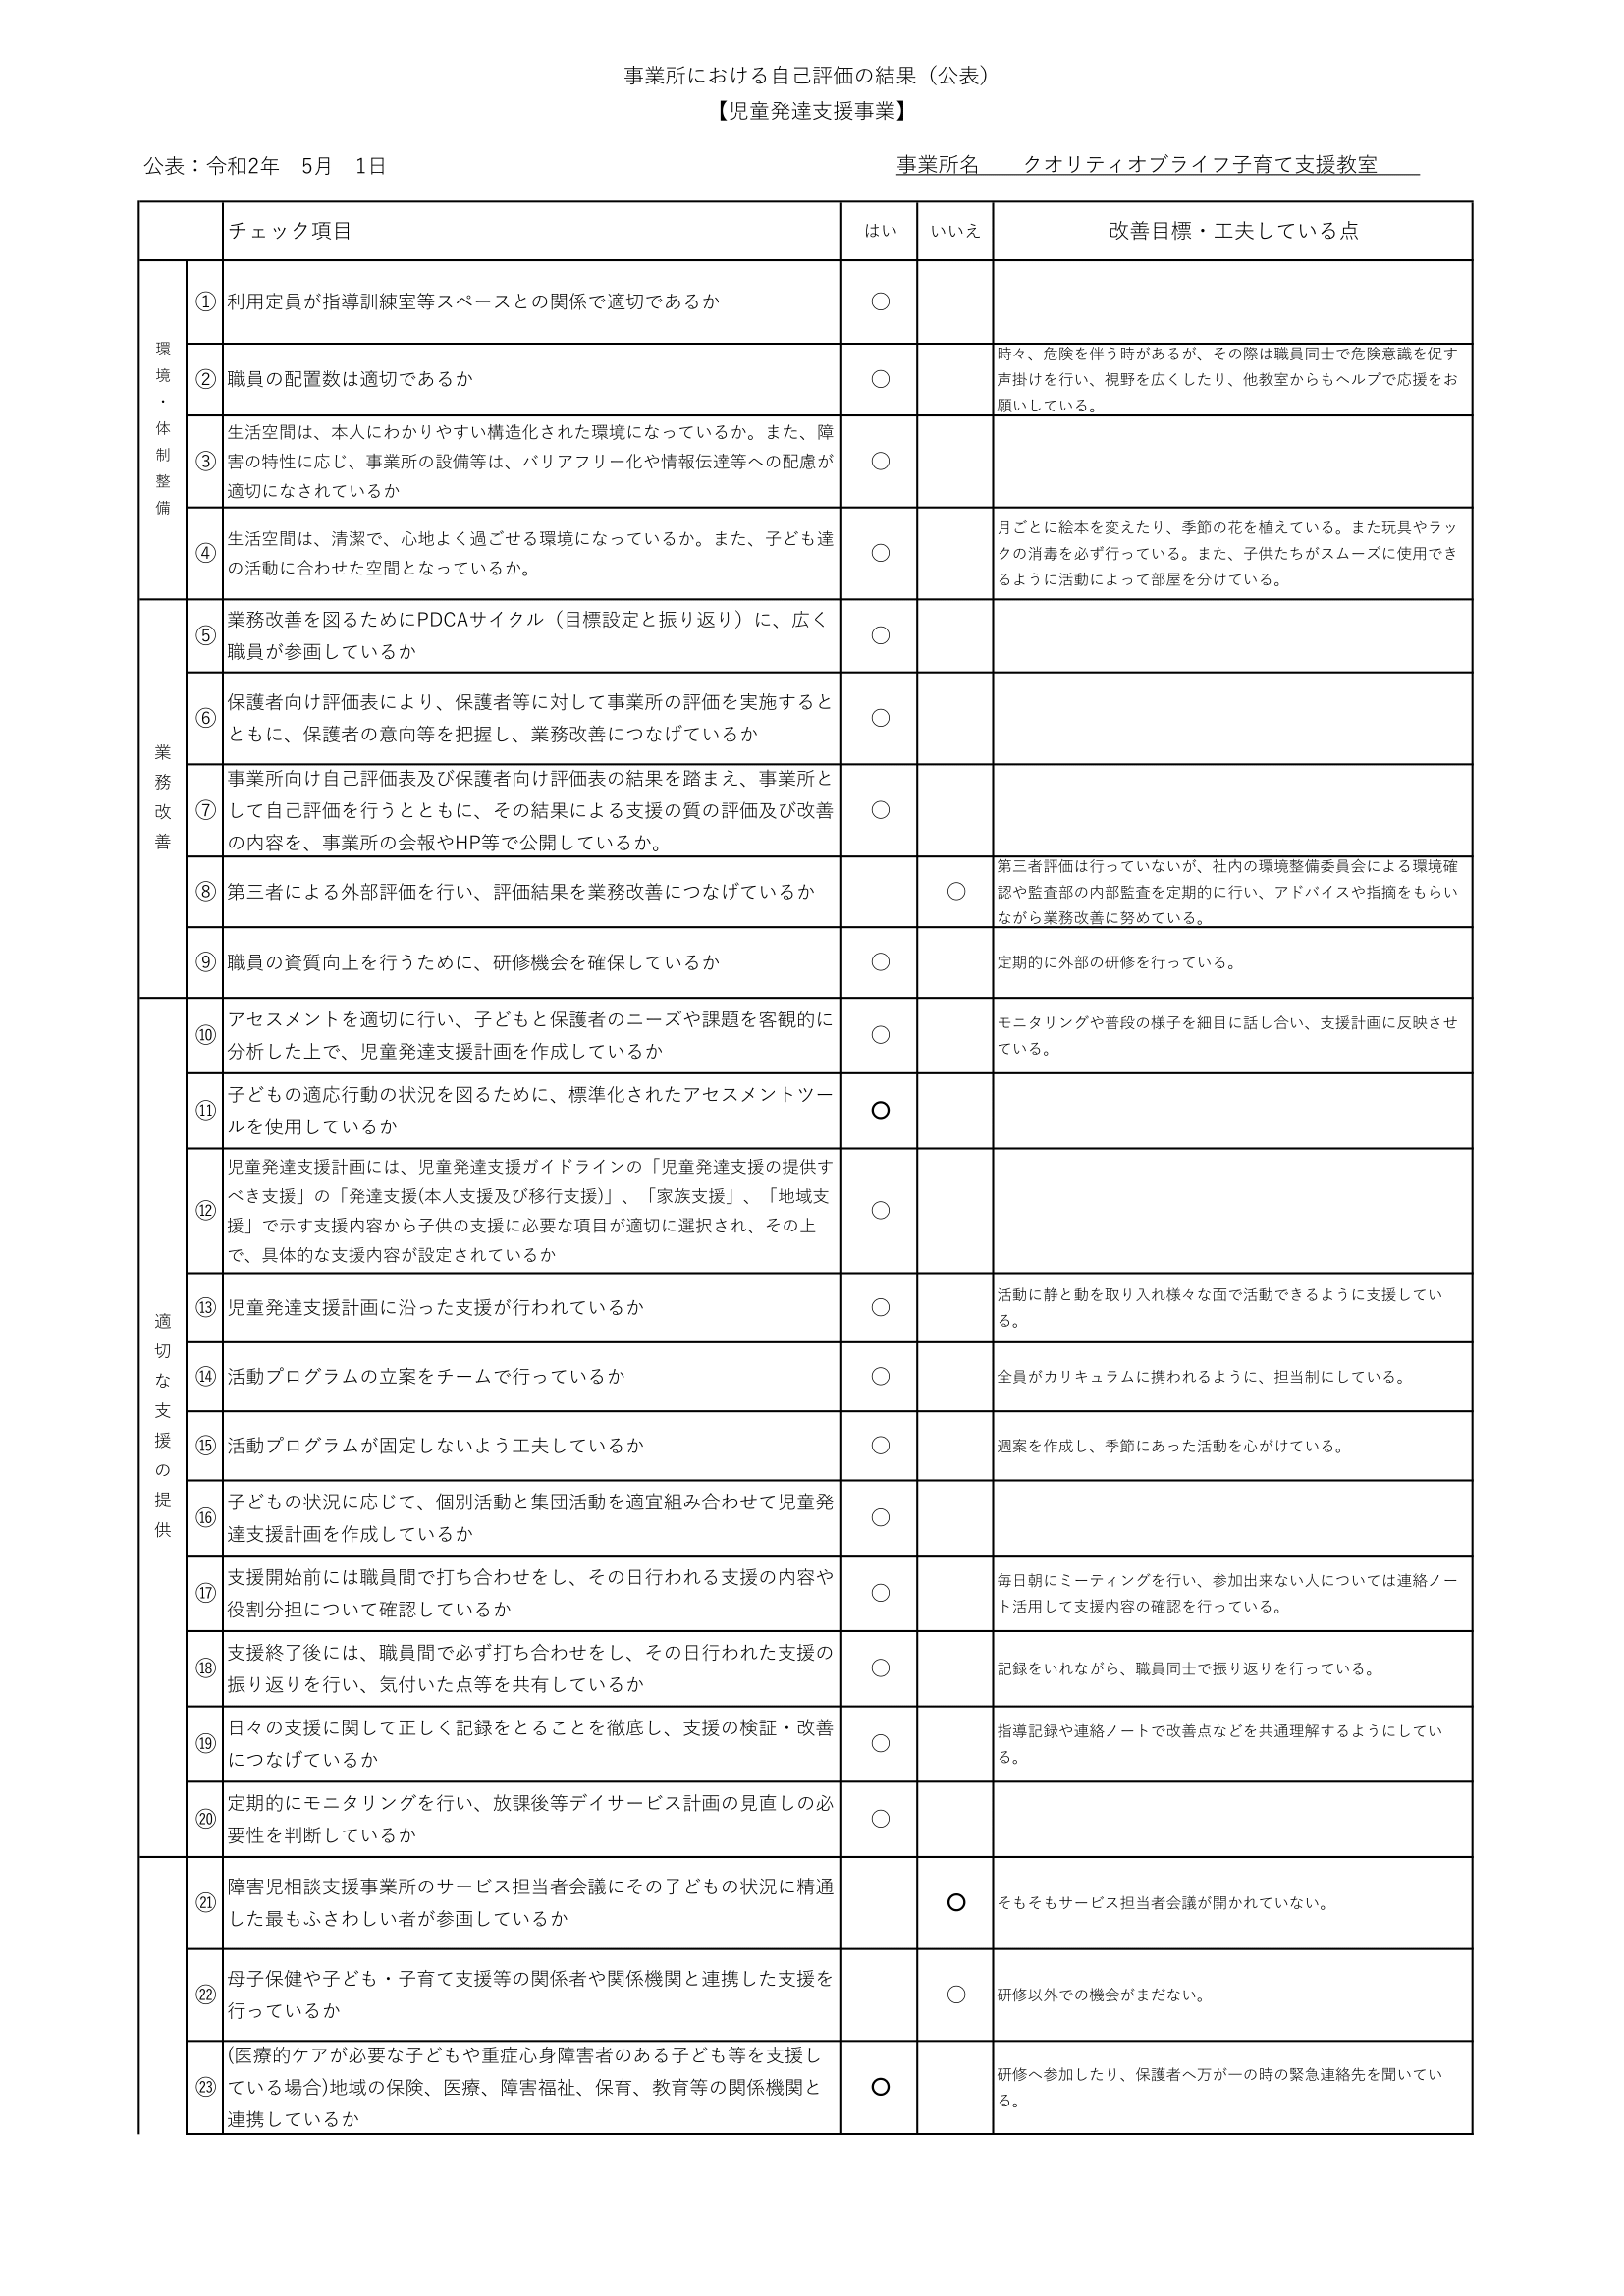 職員の自己評価表【児童デイ】(令和元年度)